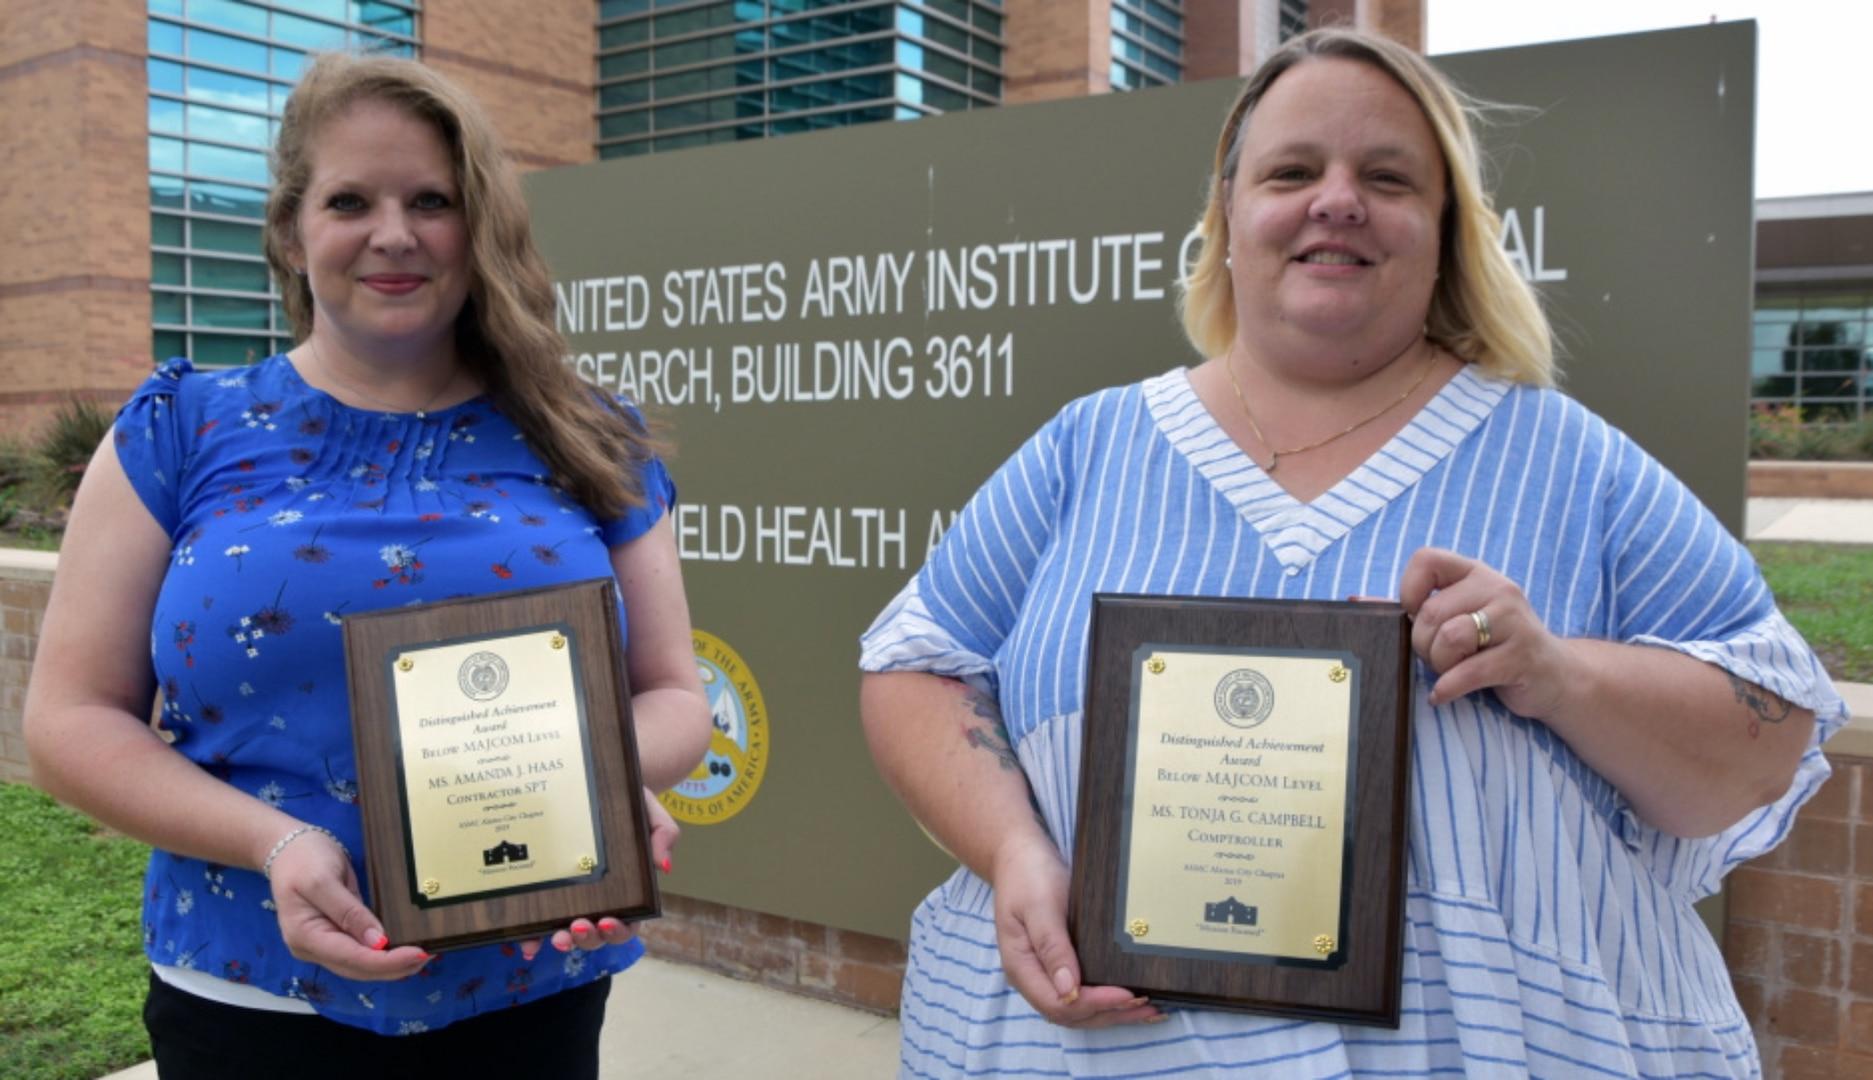 Award winners display their plaques